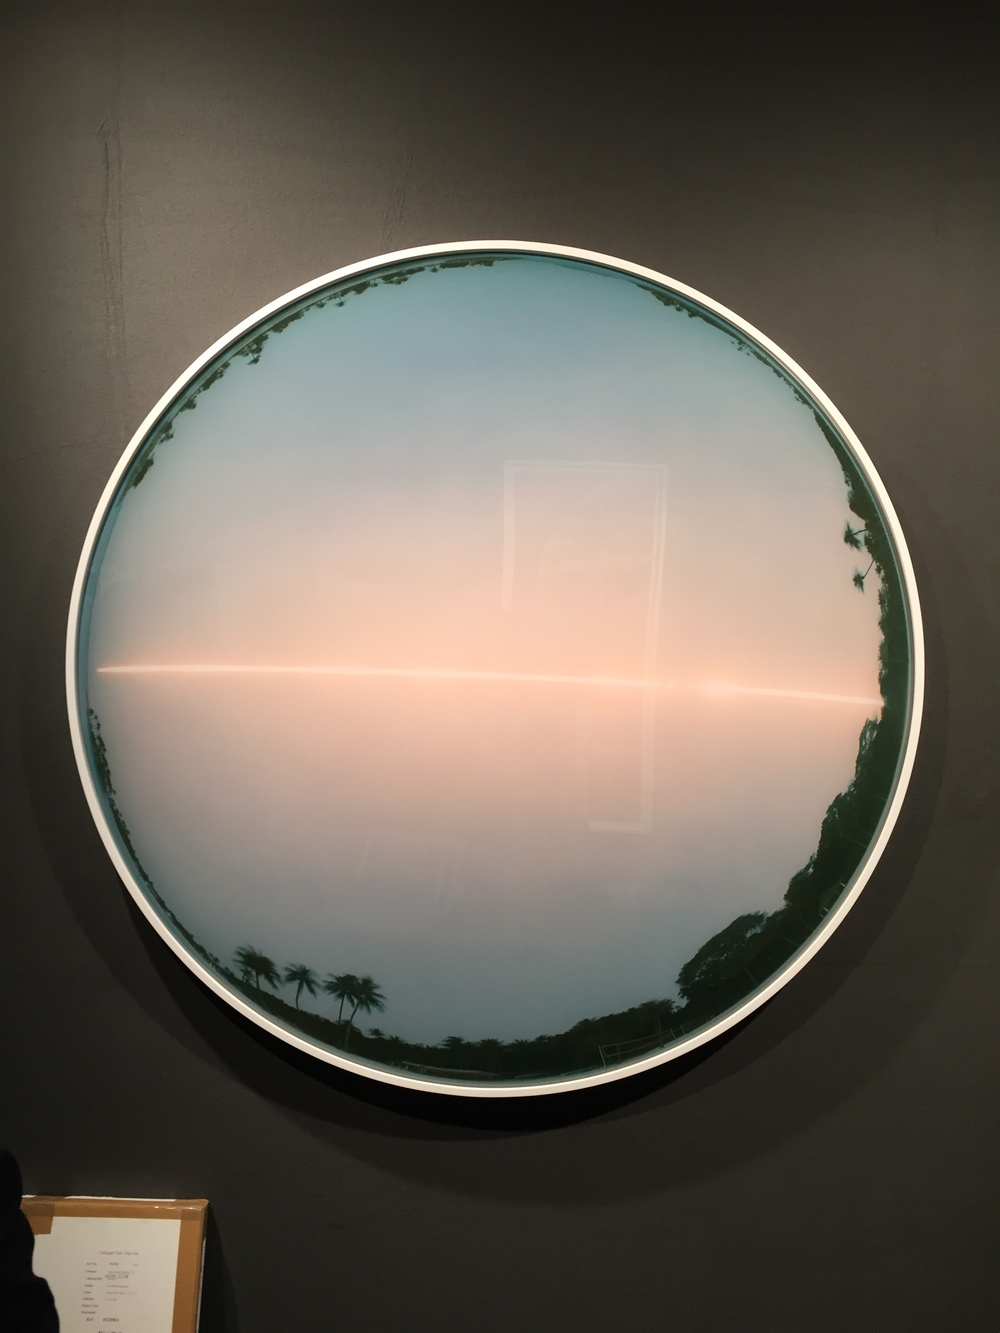 Izima Kaoru at Von Lintel Gallery